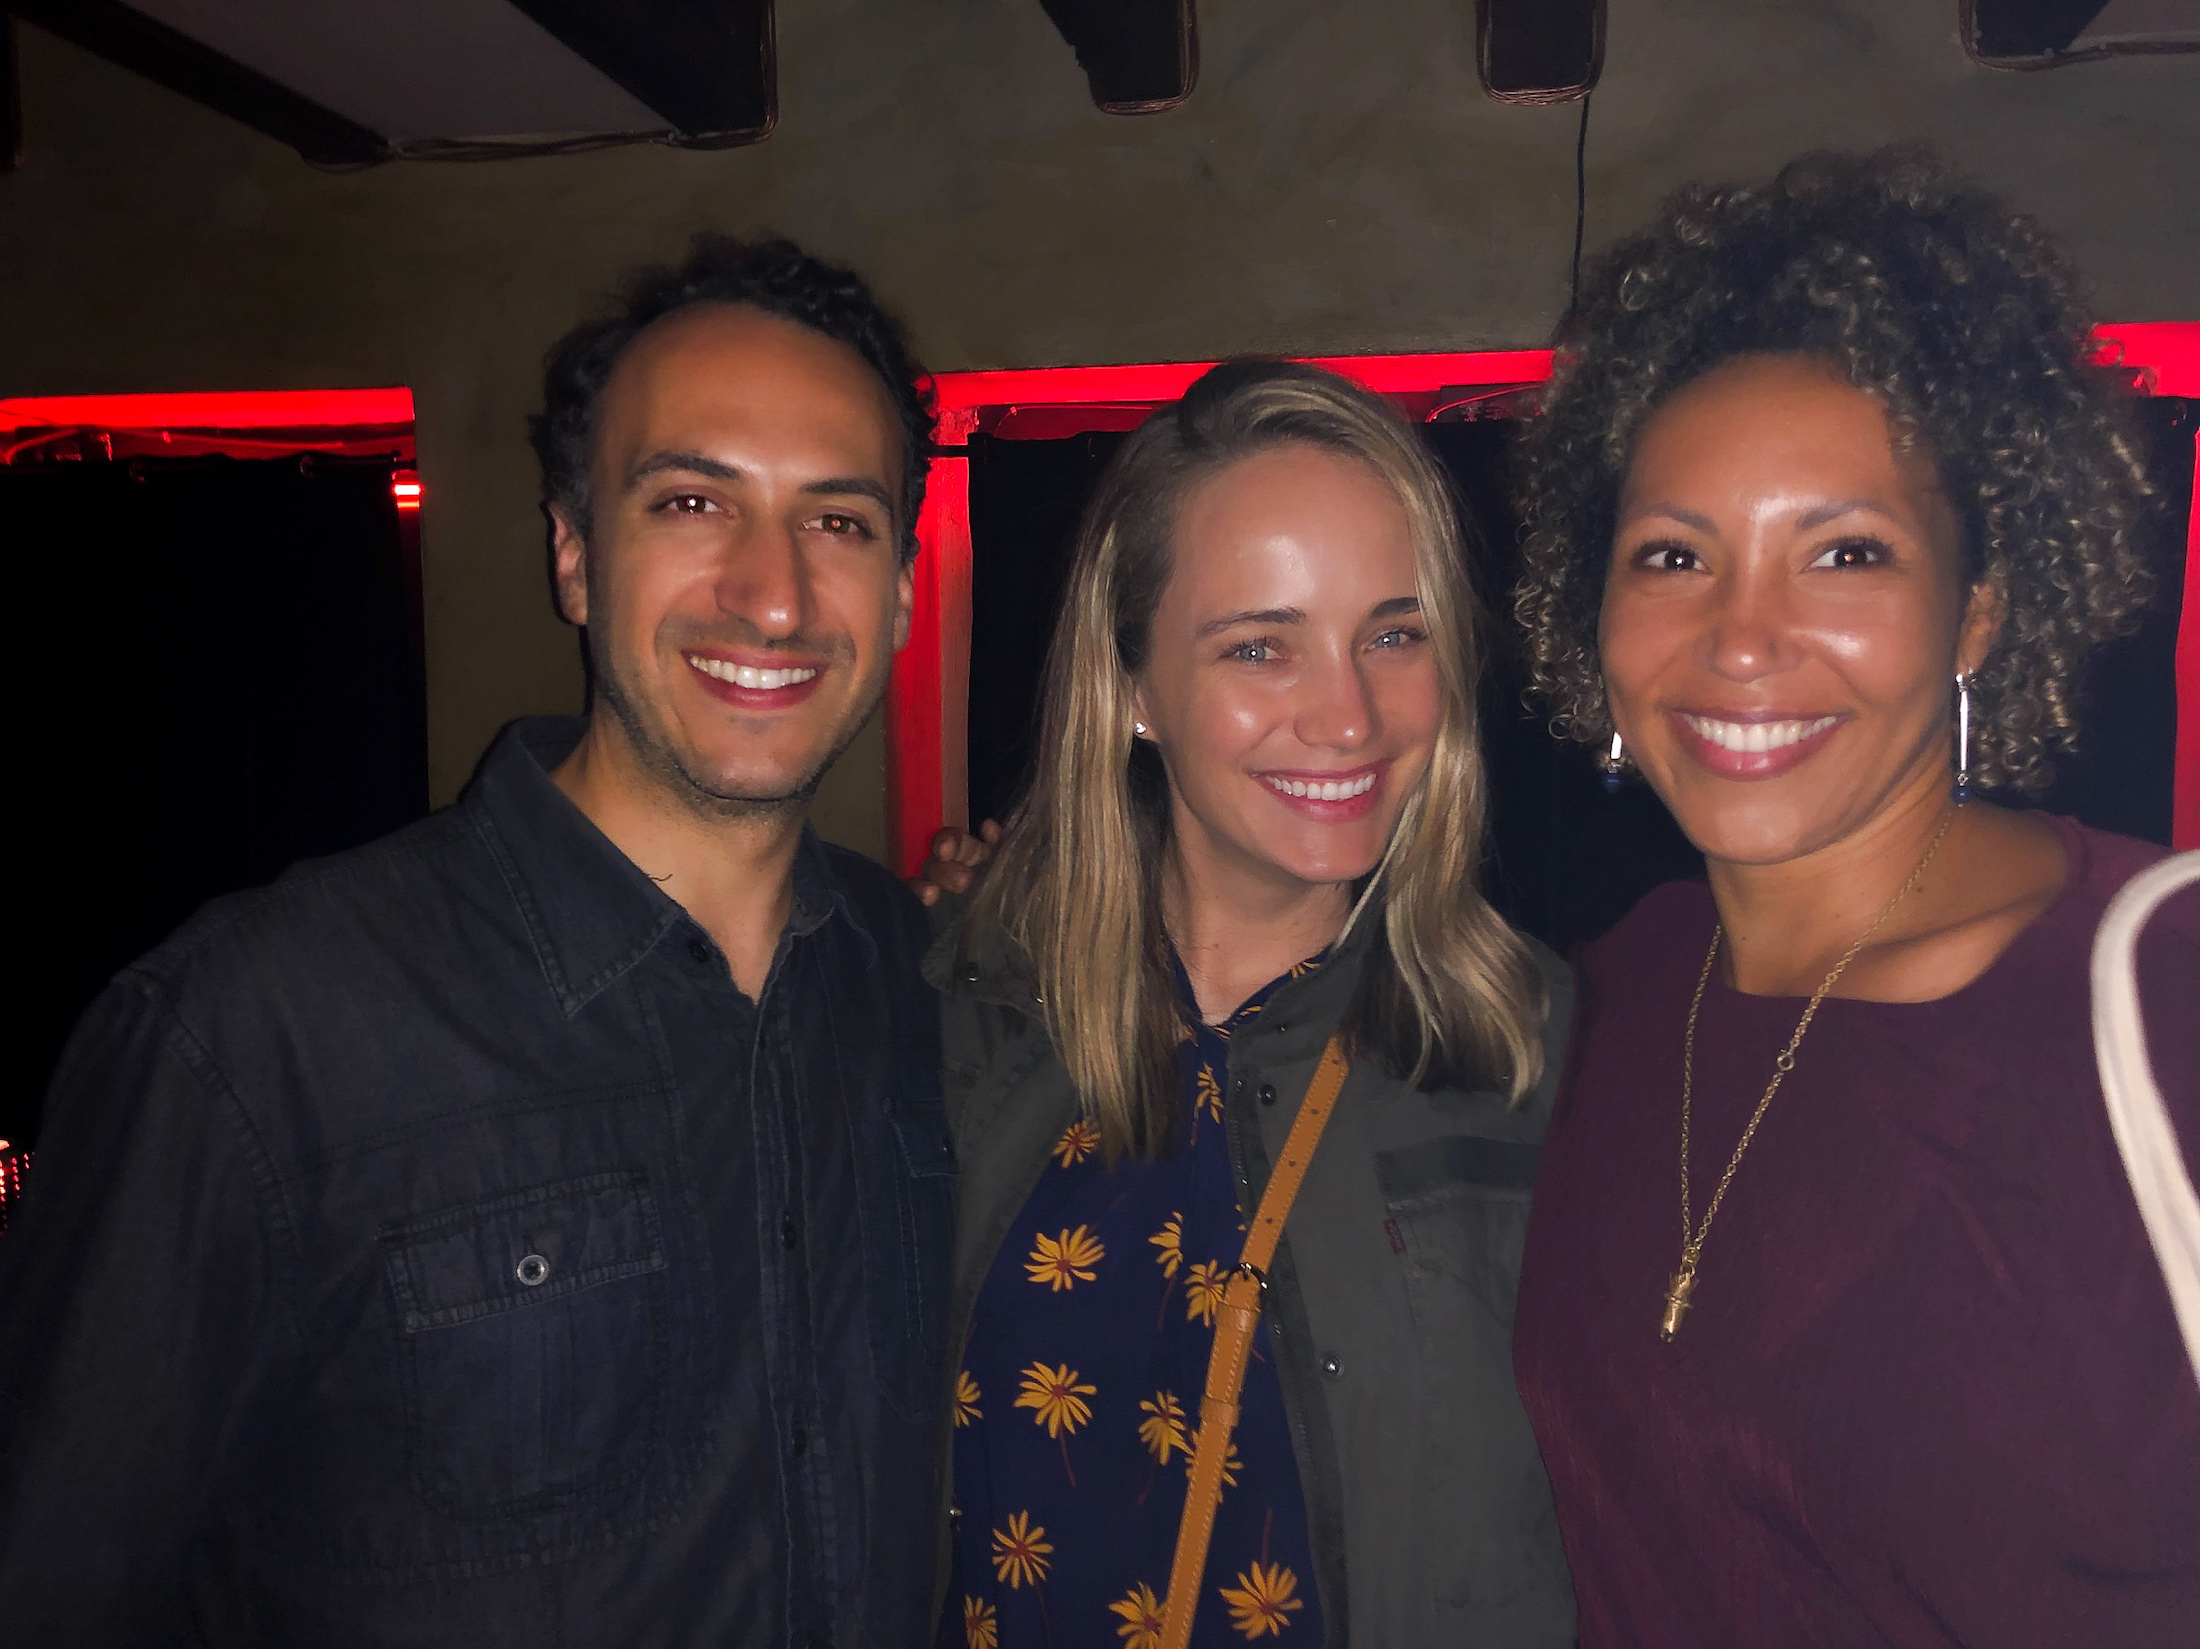 Joey, Lauren and Grace in Cuba